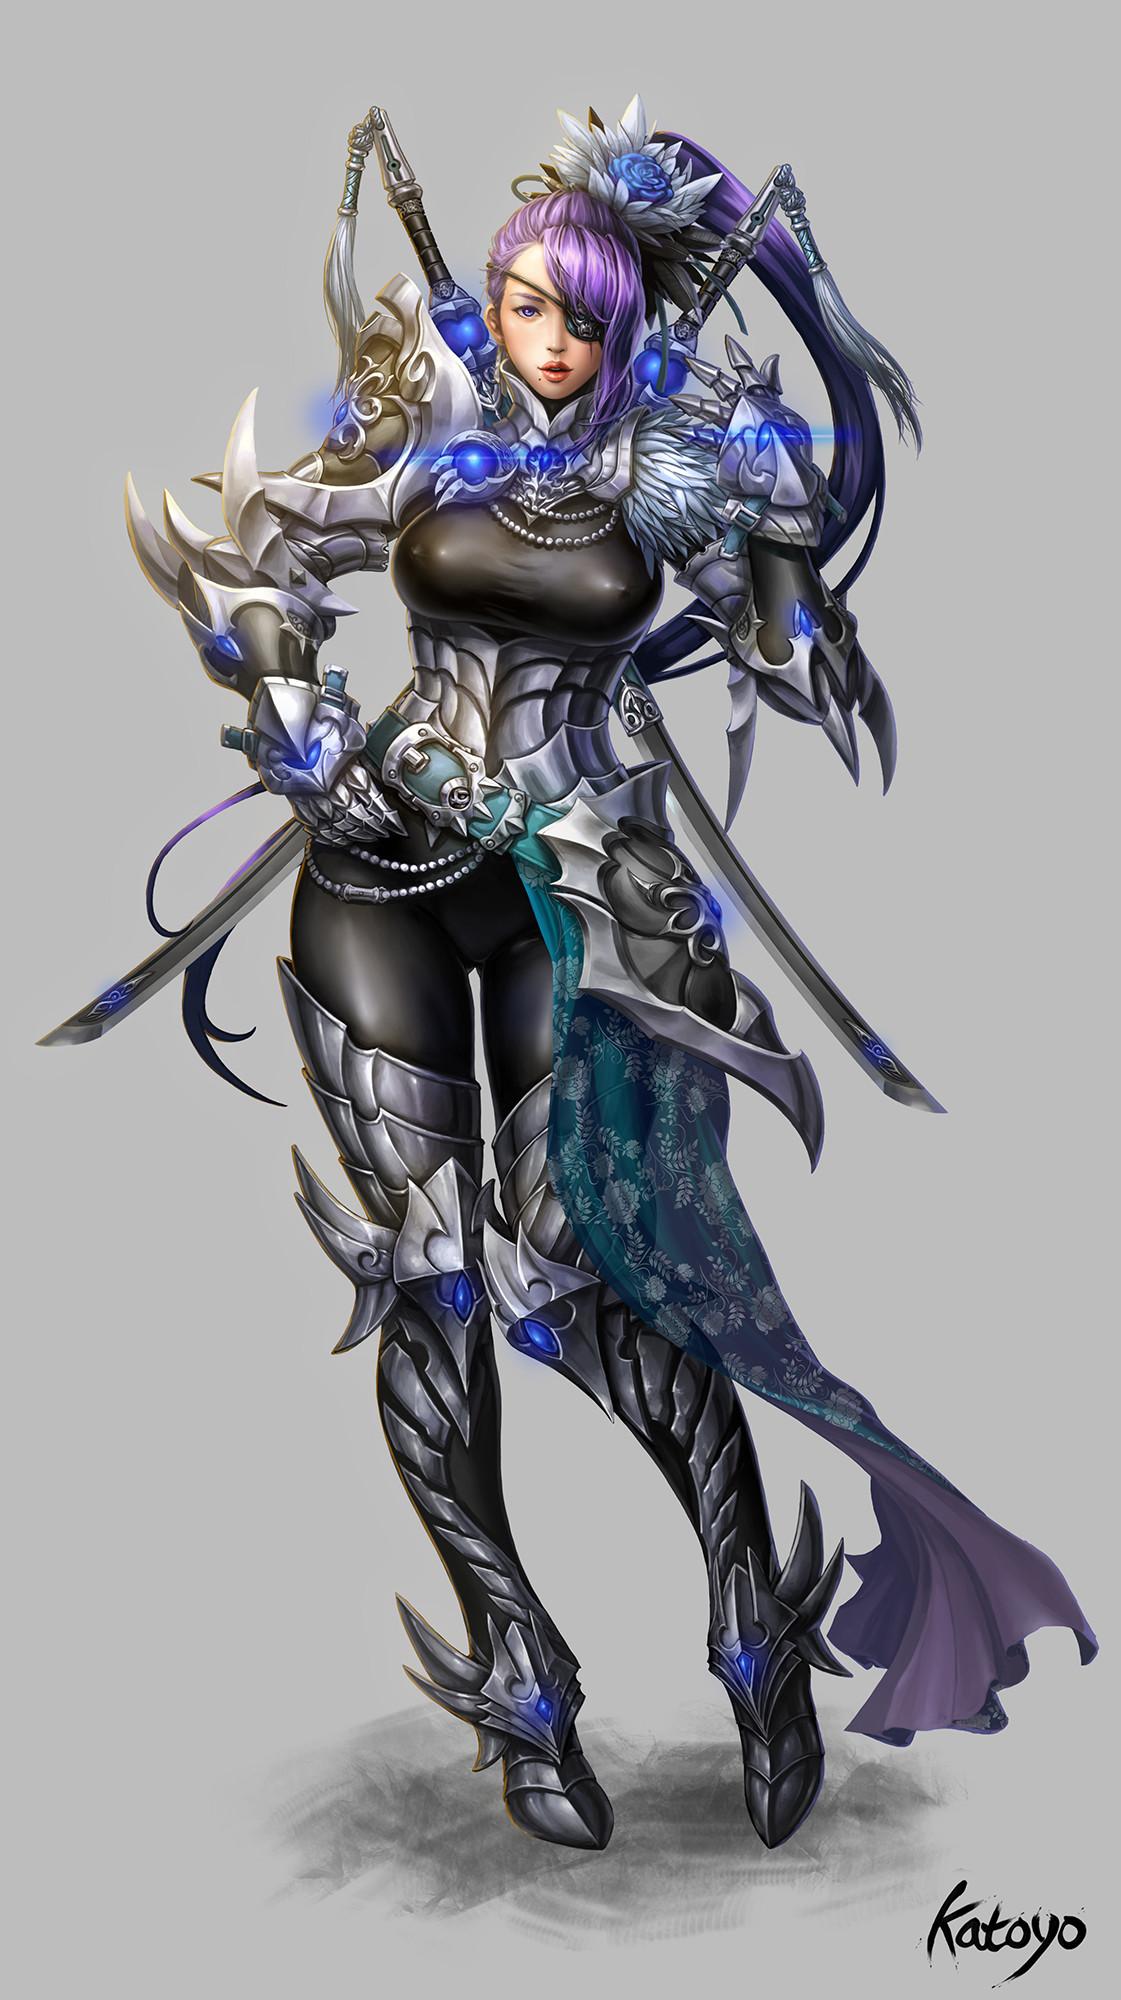 Sanghyun yu blade master katoyo